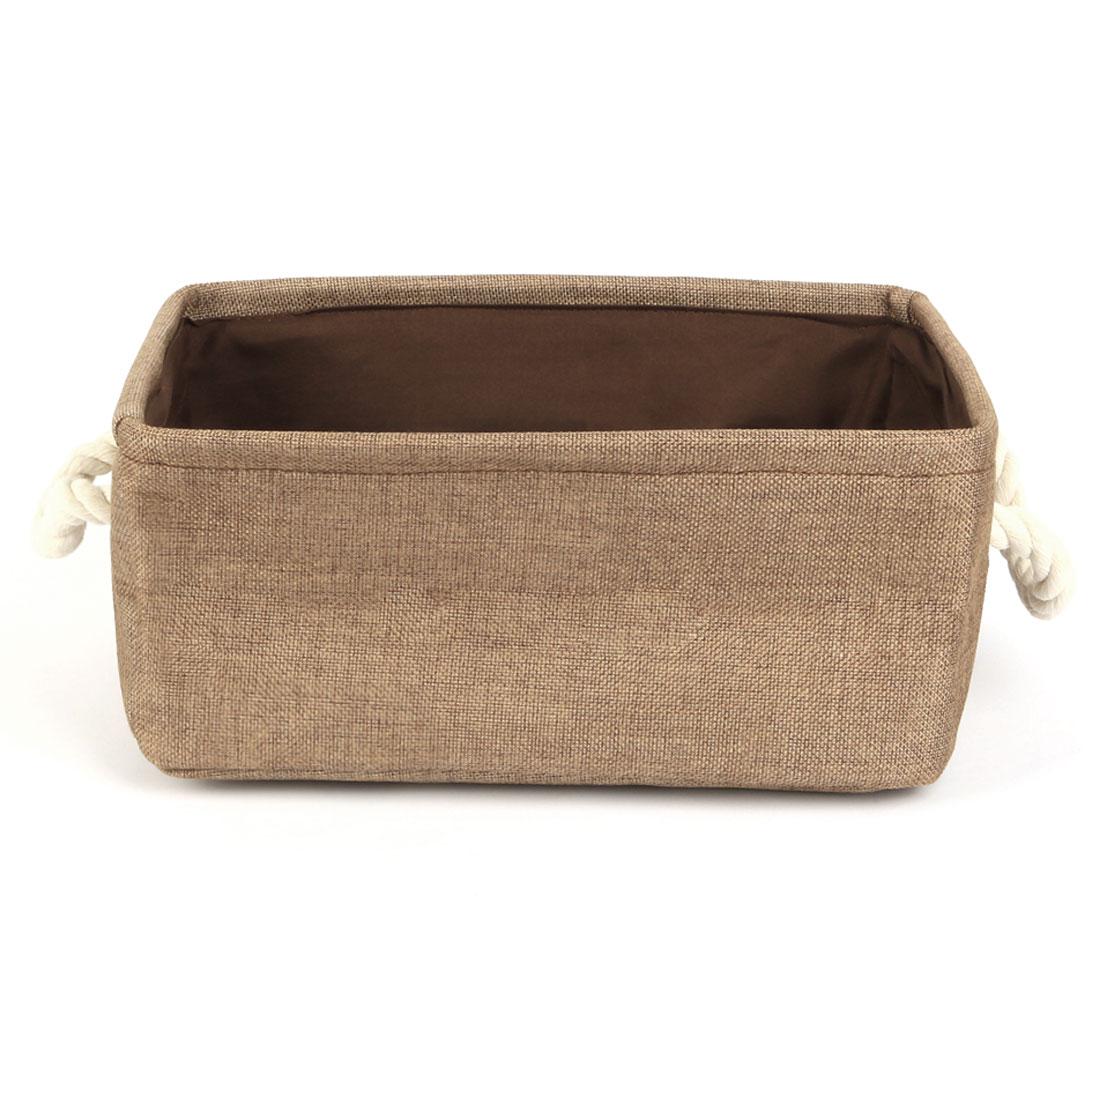 Home Fabric Storage Bin Basket Closet Toy Box Container Organizer Coffee Color